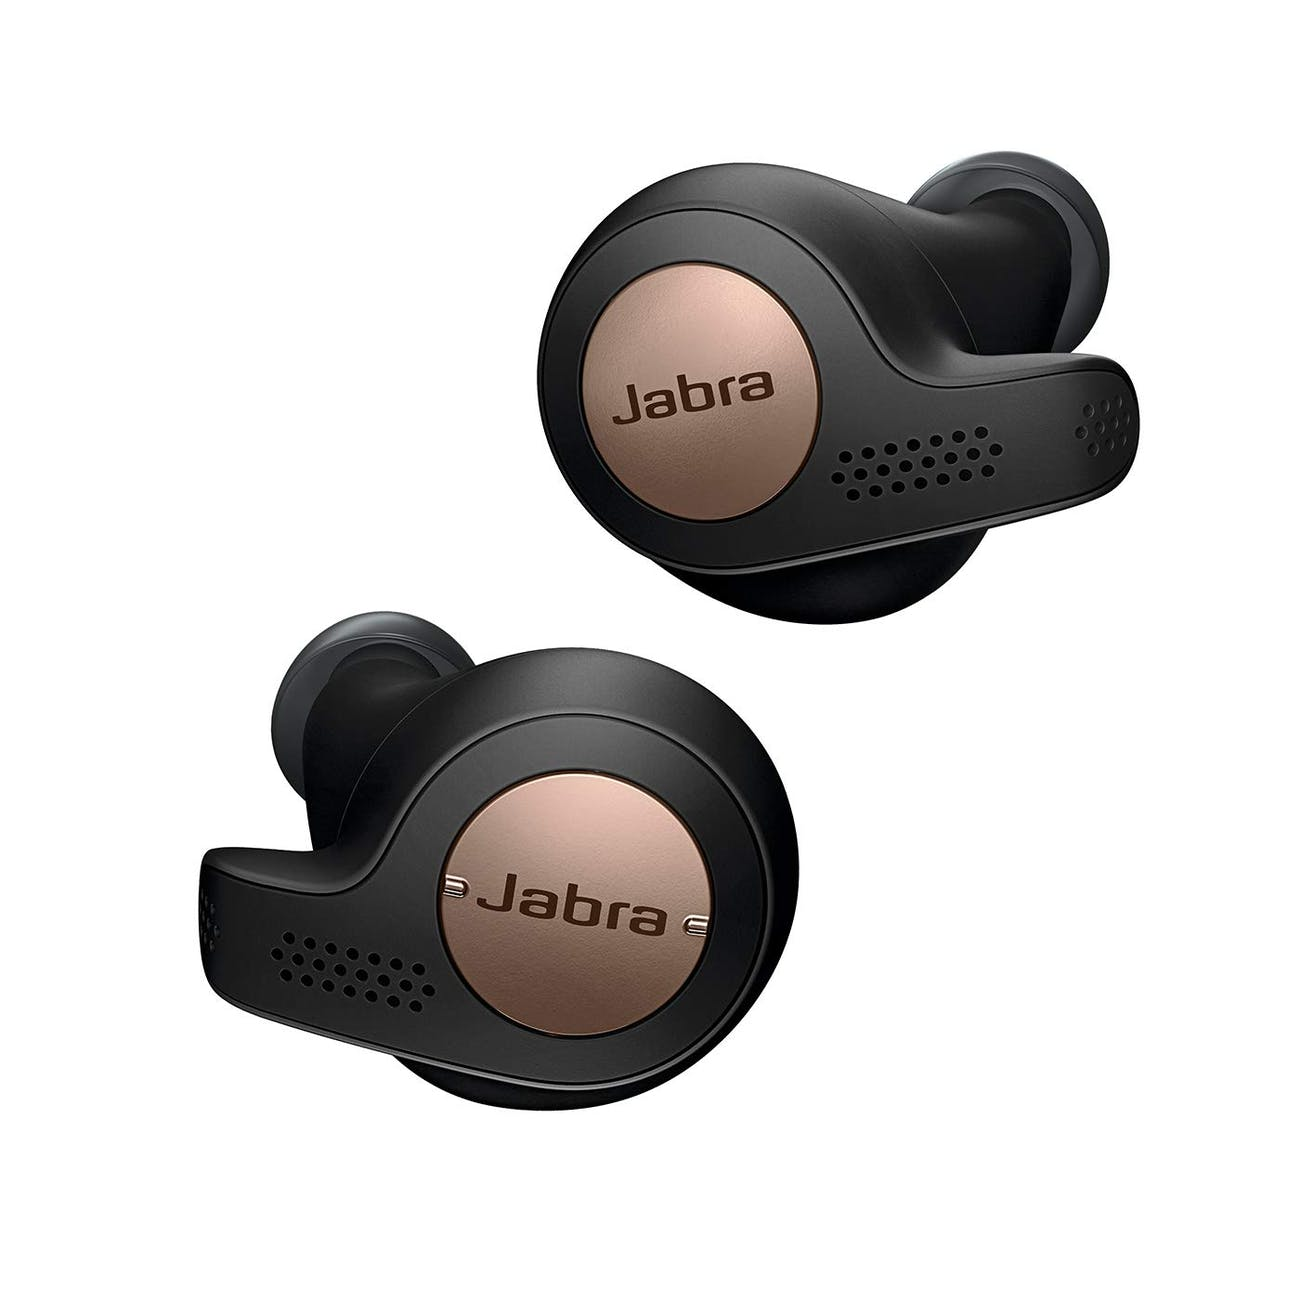 Jabra Elite 65t Alexa Enabled True Wireless Earbuds Charging Case  – Titanium Black